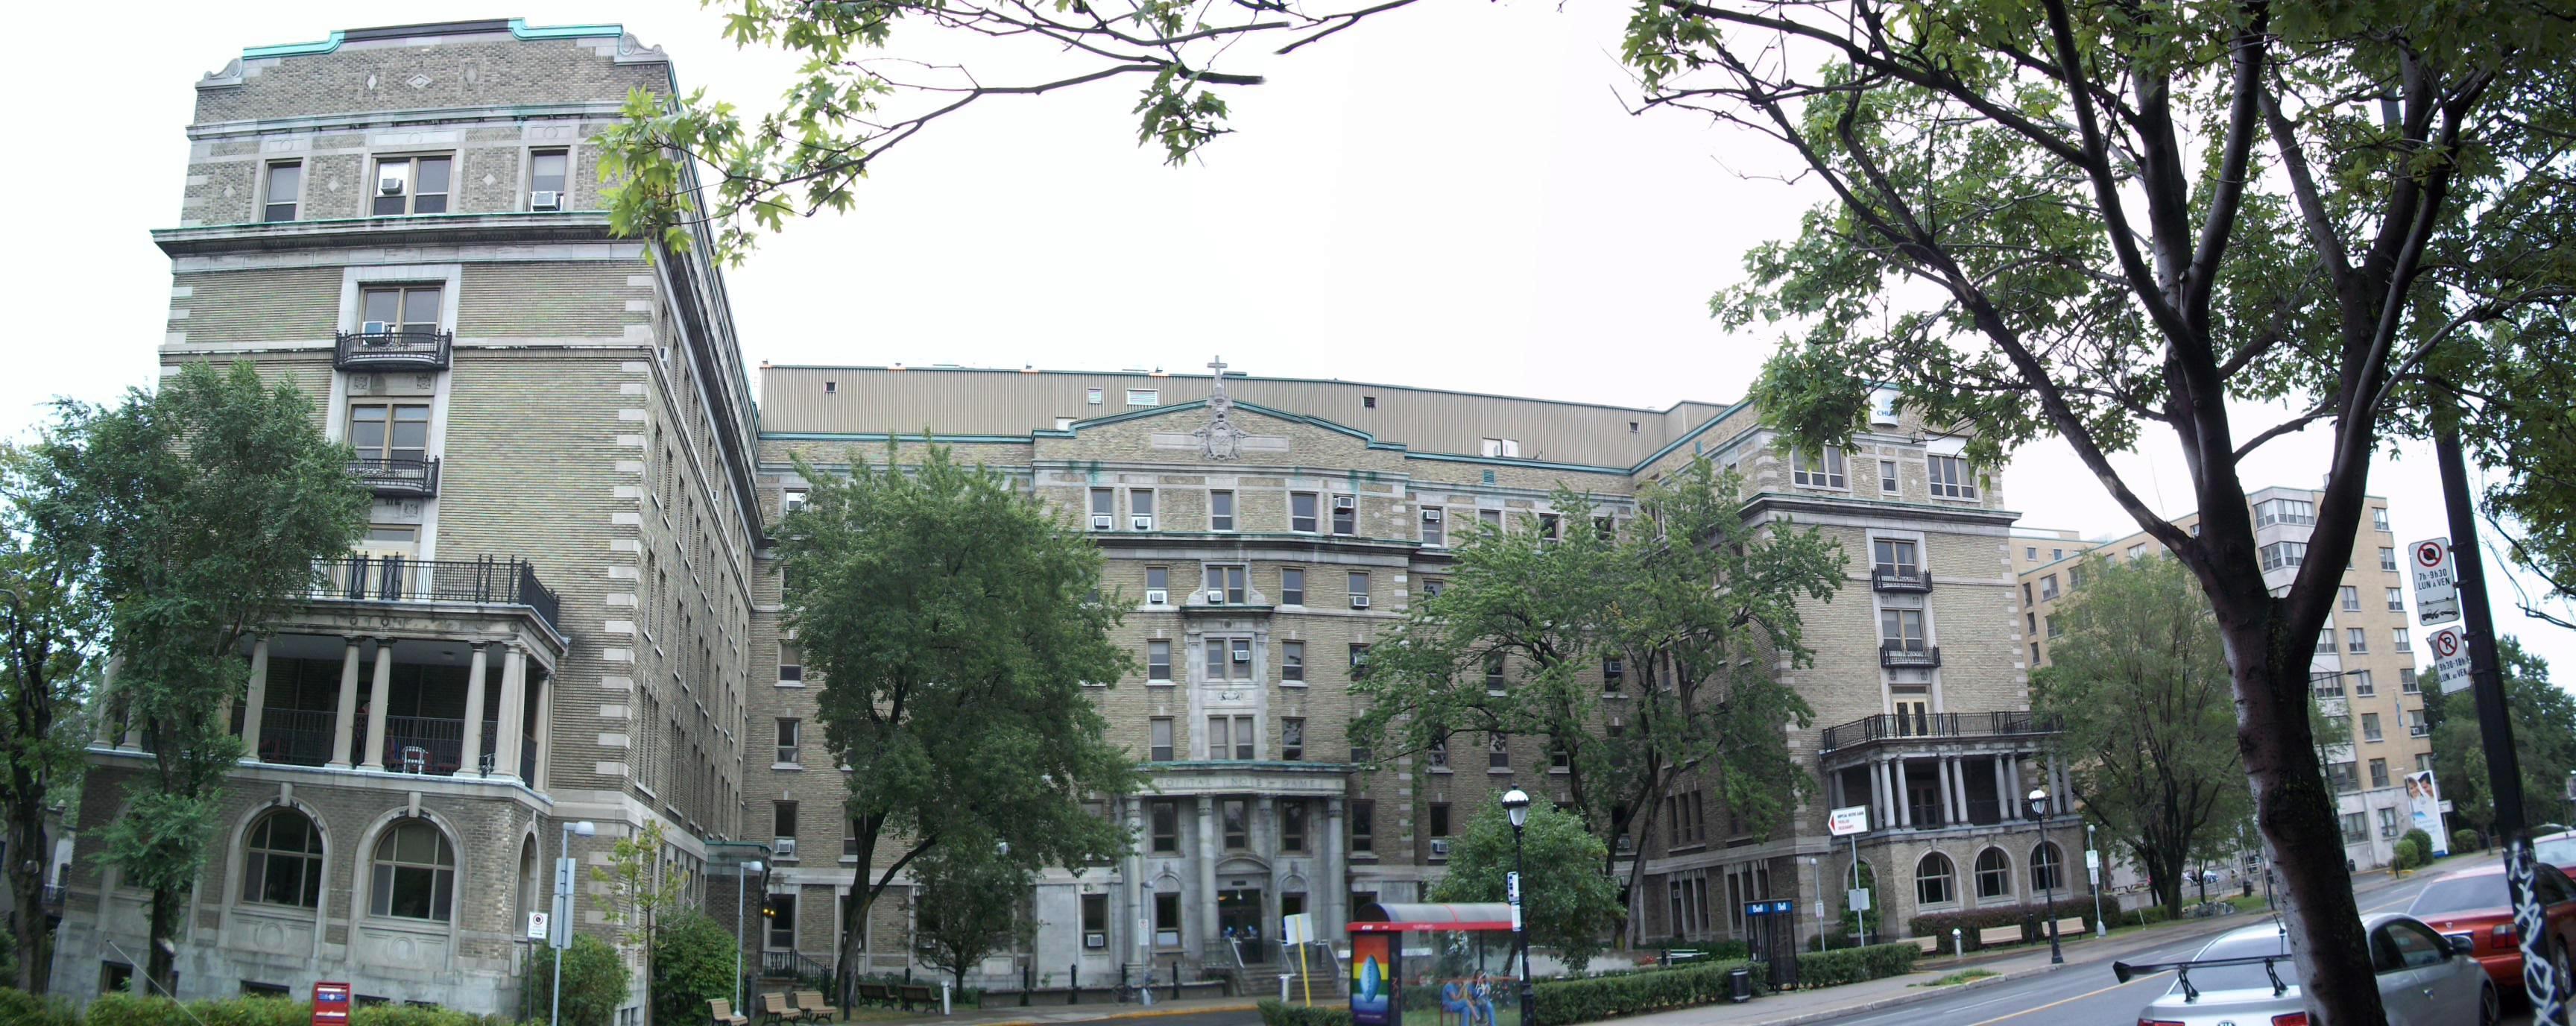 Hotels Montreal Sherbrooke Street East